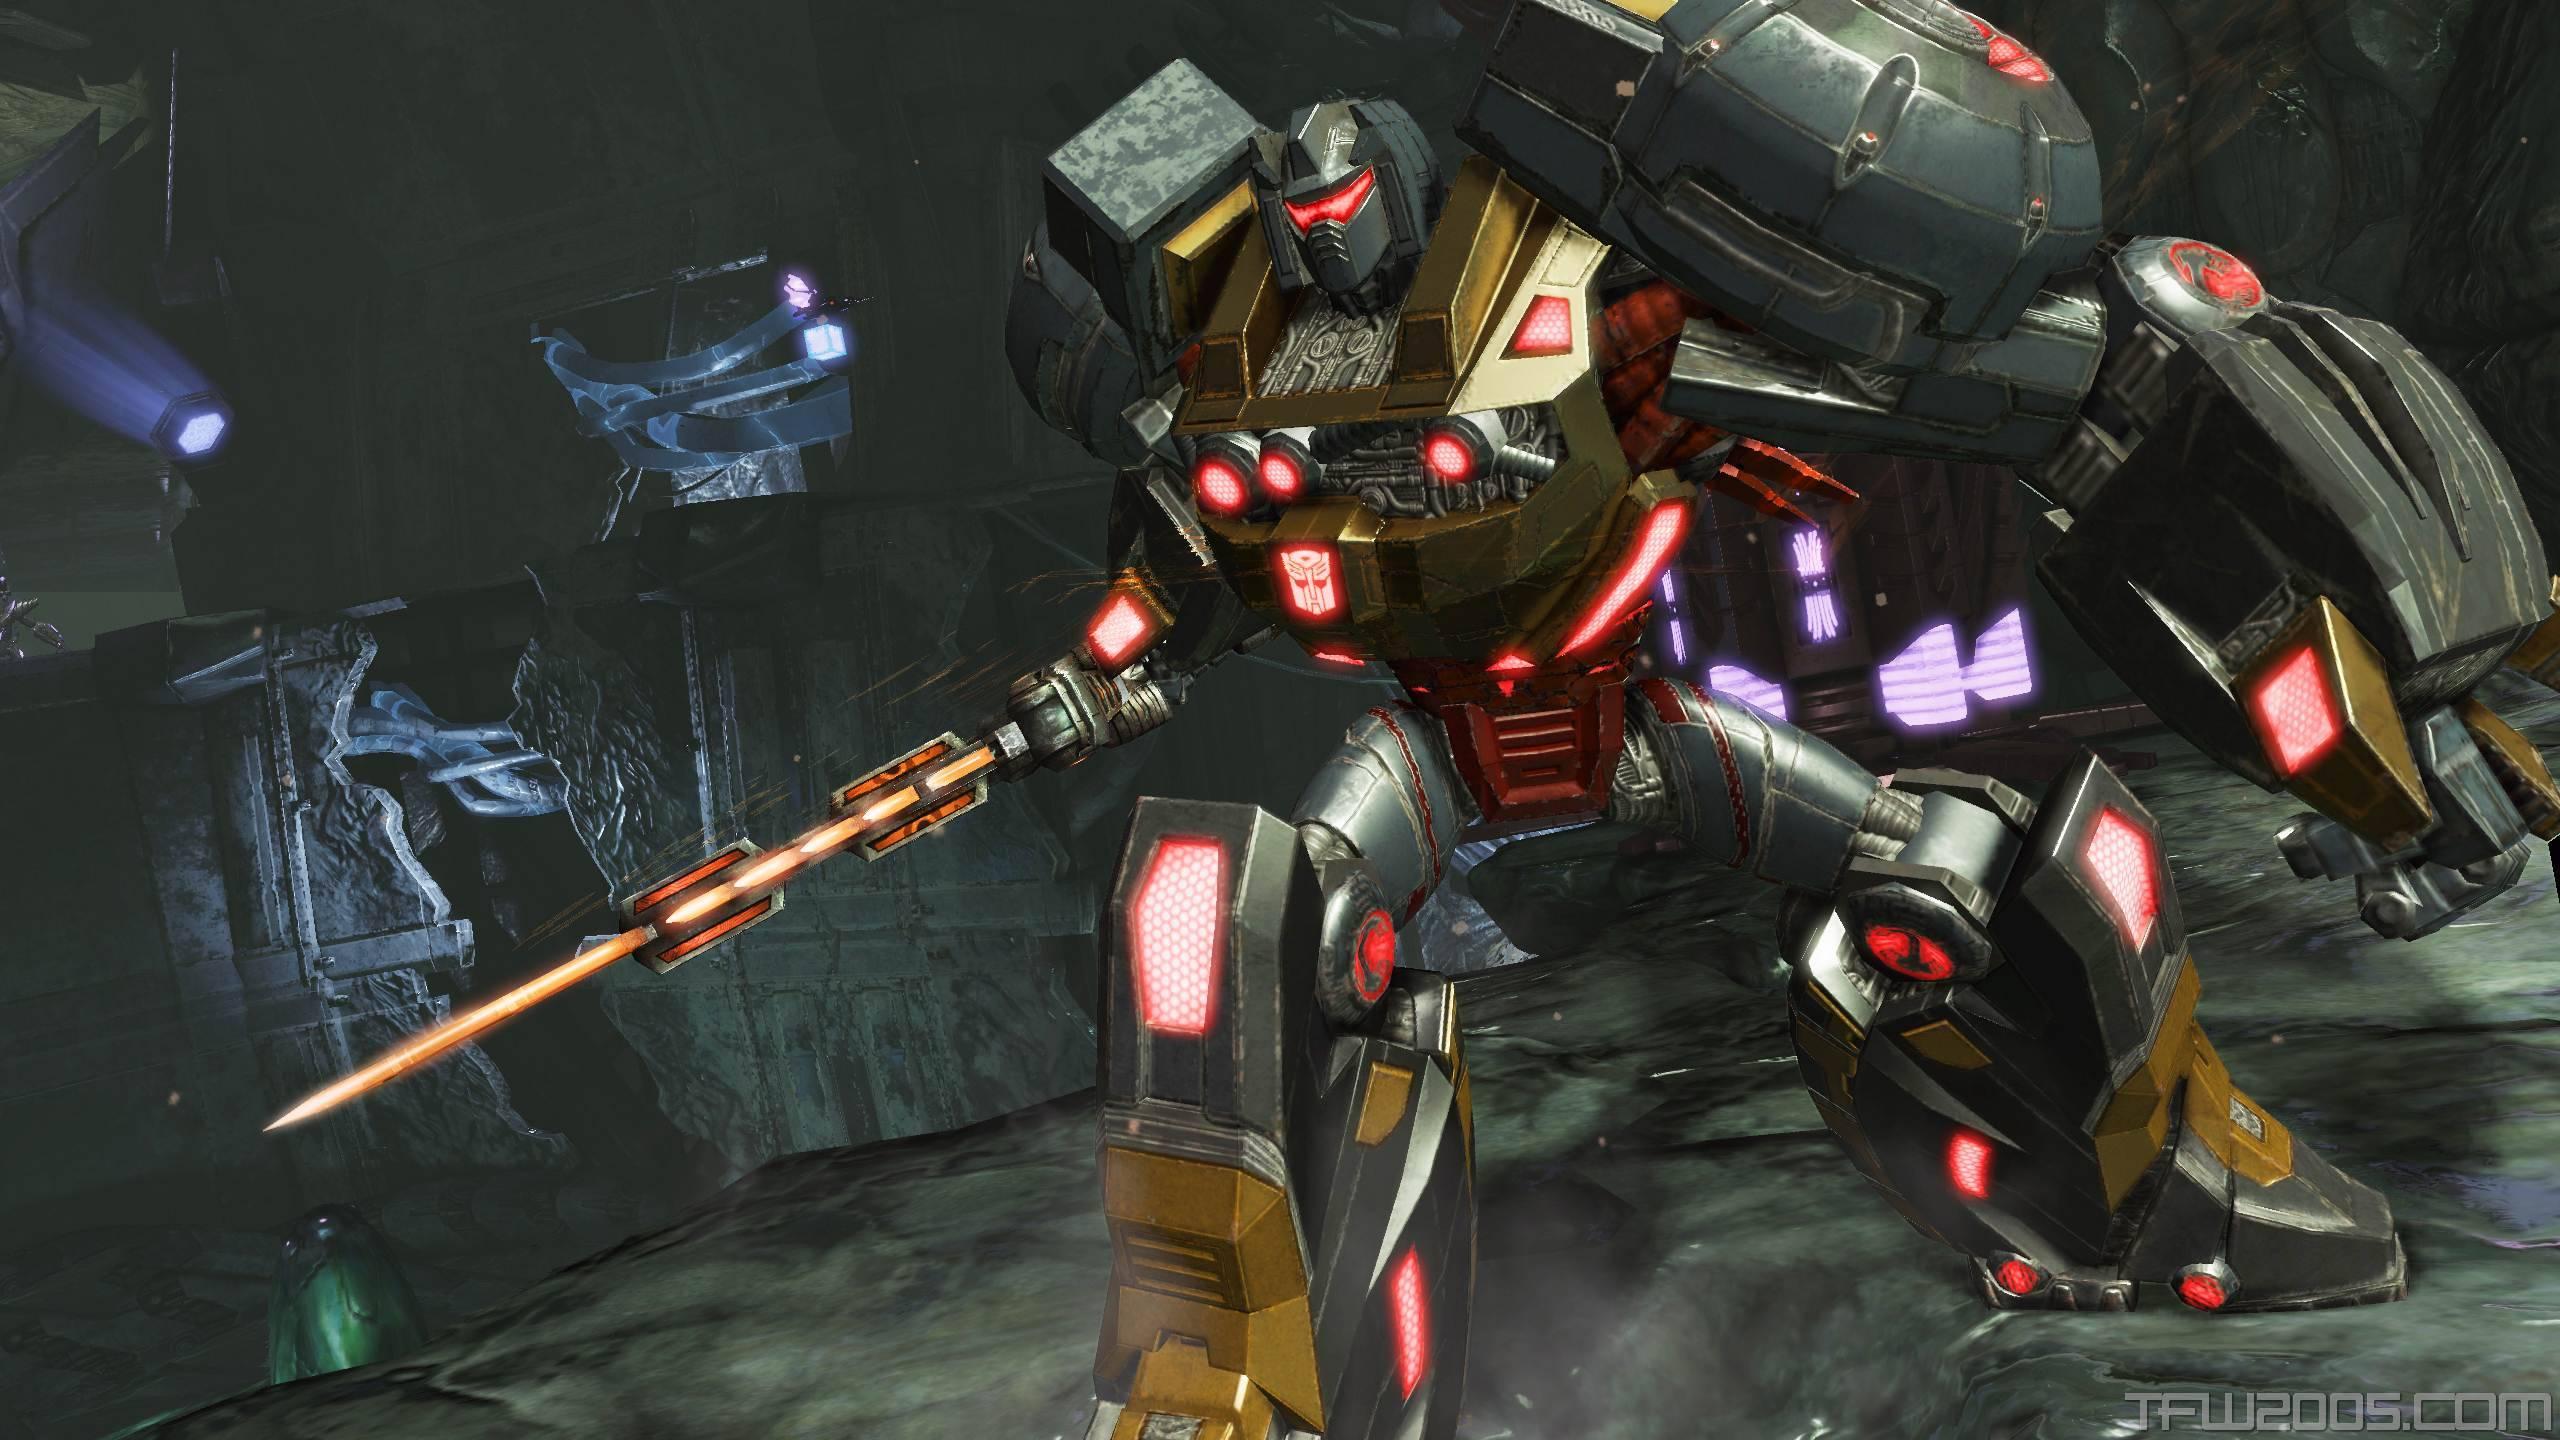 Grimlock Fall of Cybertron   Transformers Wallpaper 2560x1440